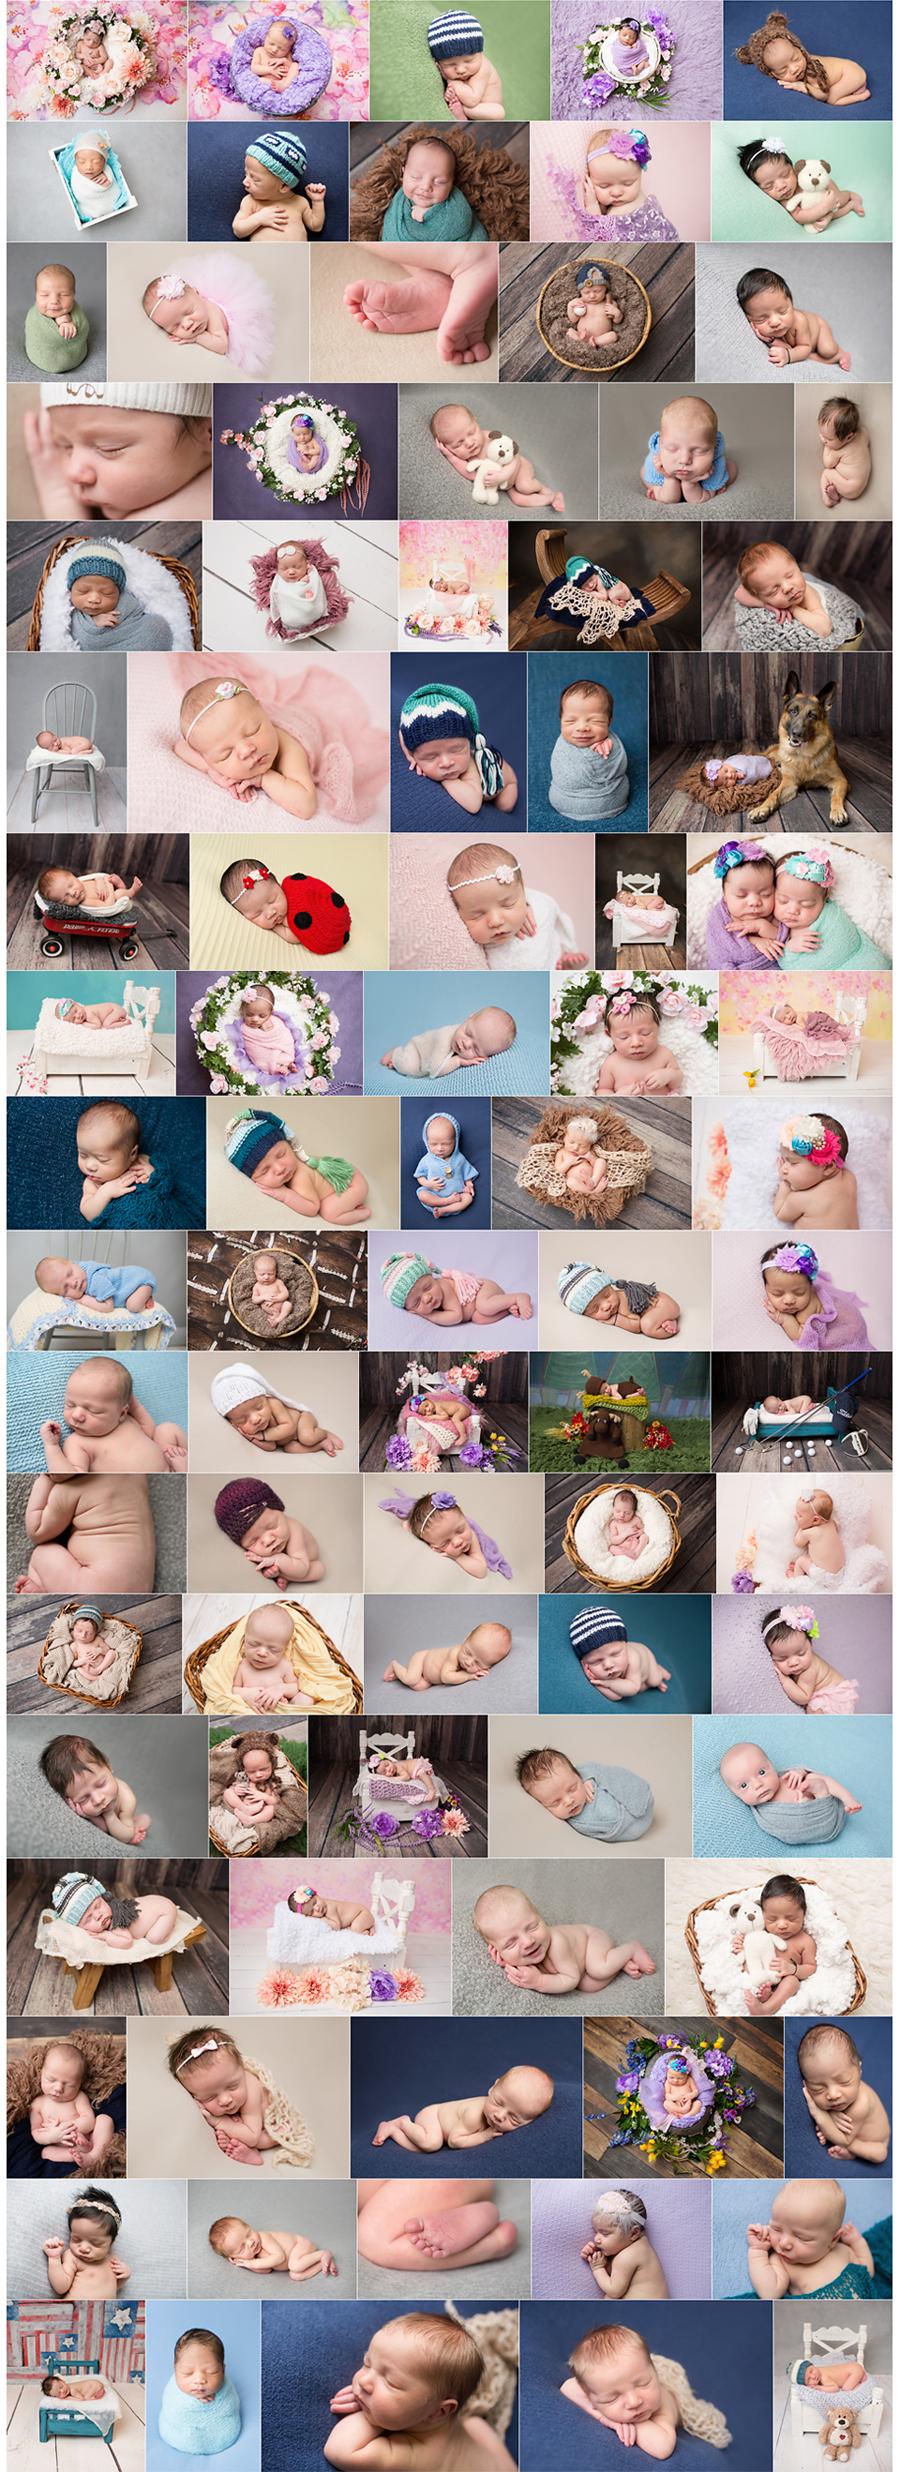 northern virginia newborn photographer_2019 babies_weba_2